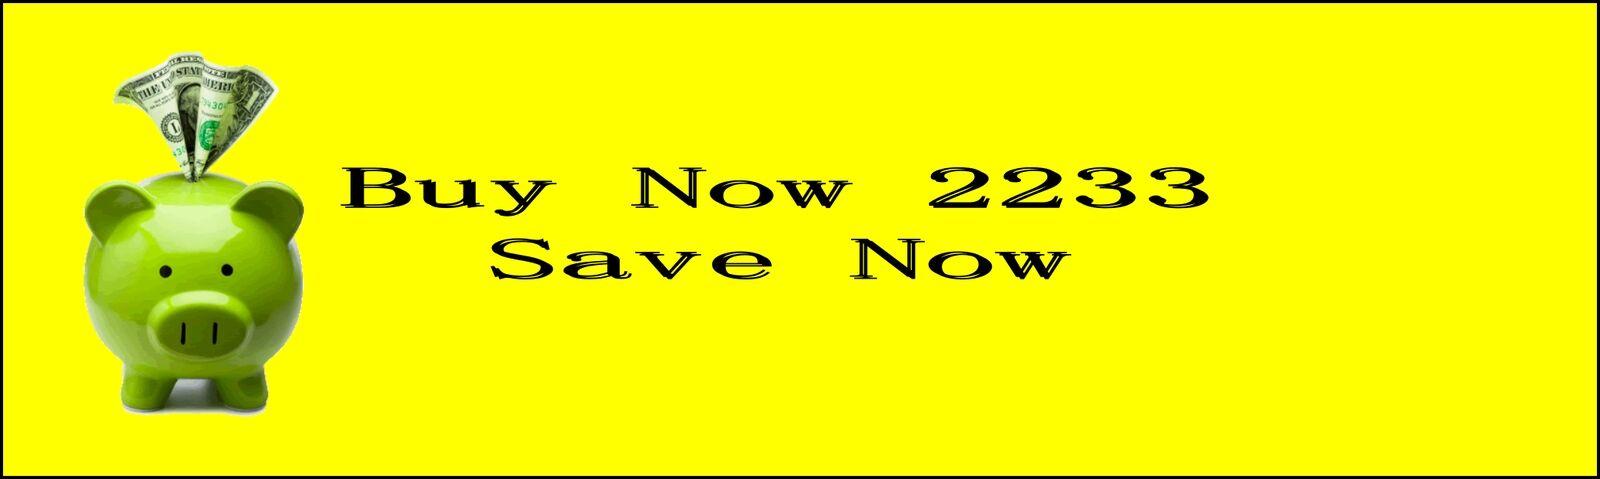 Buy Now 2233